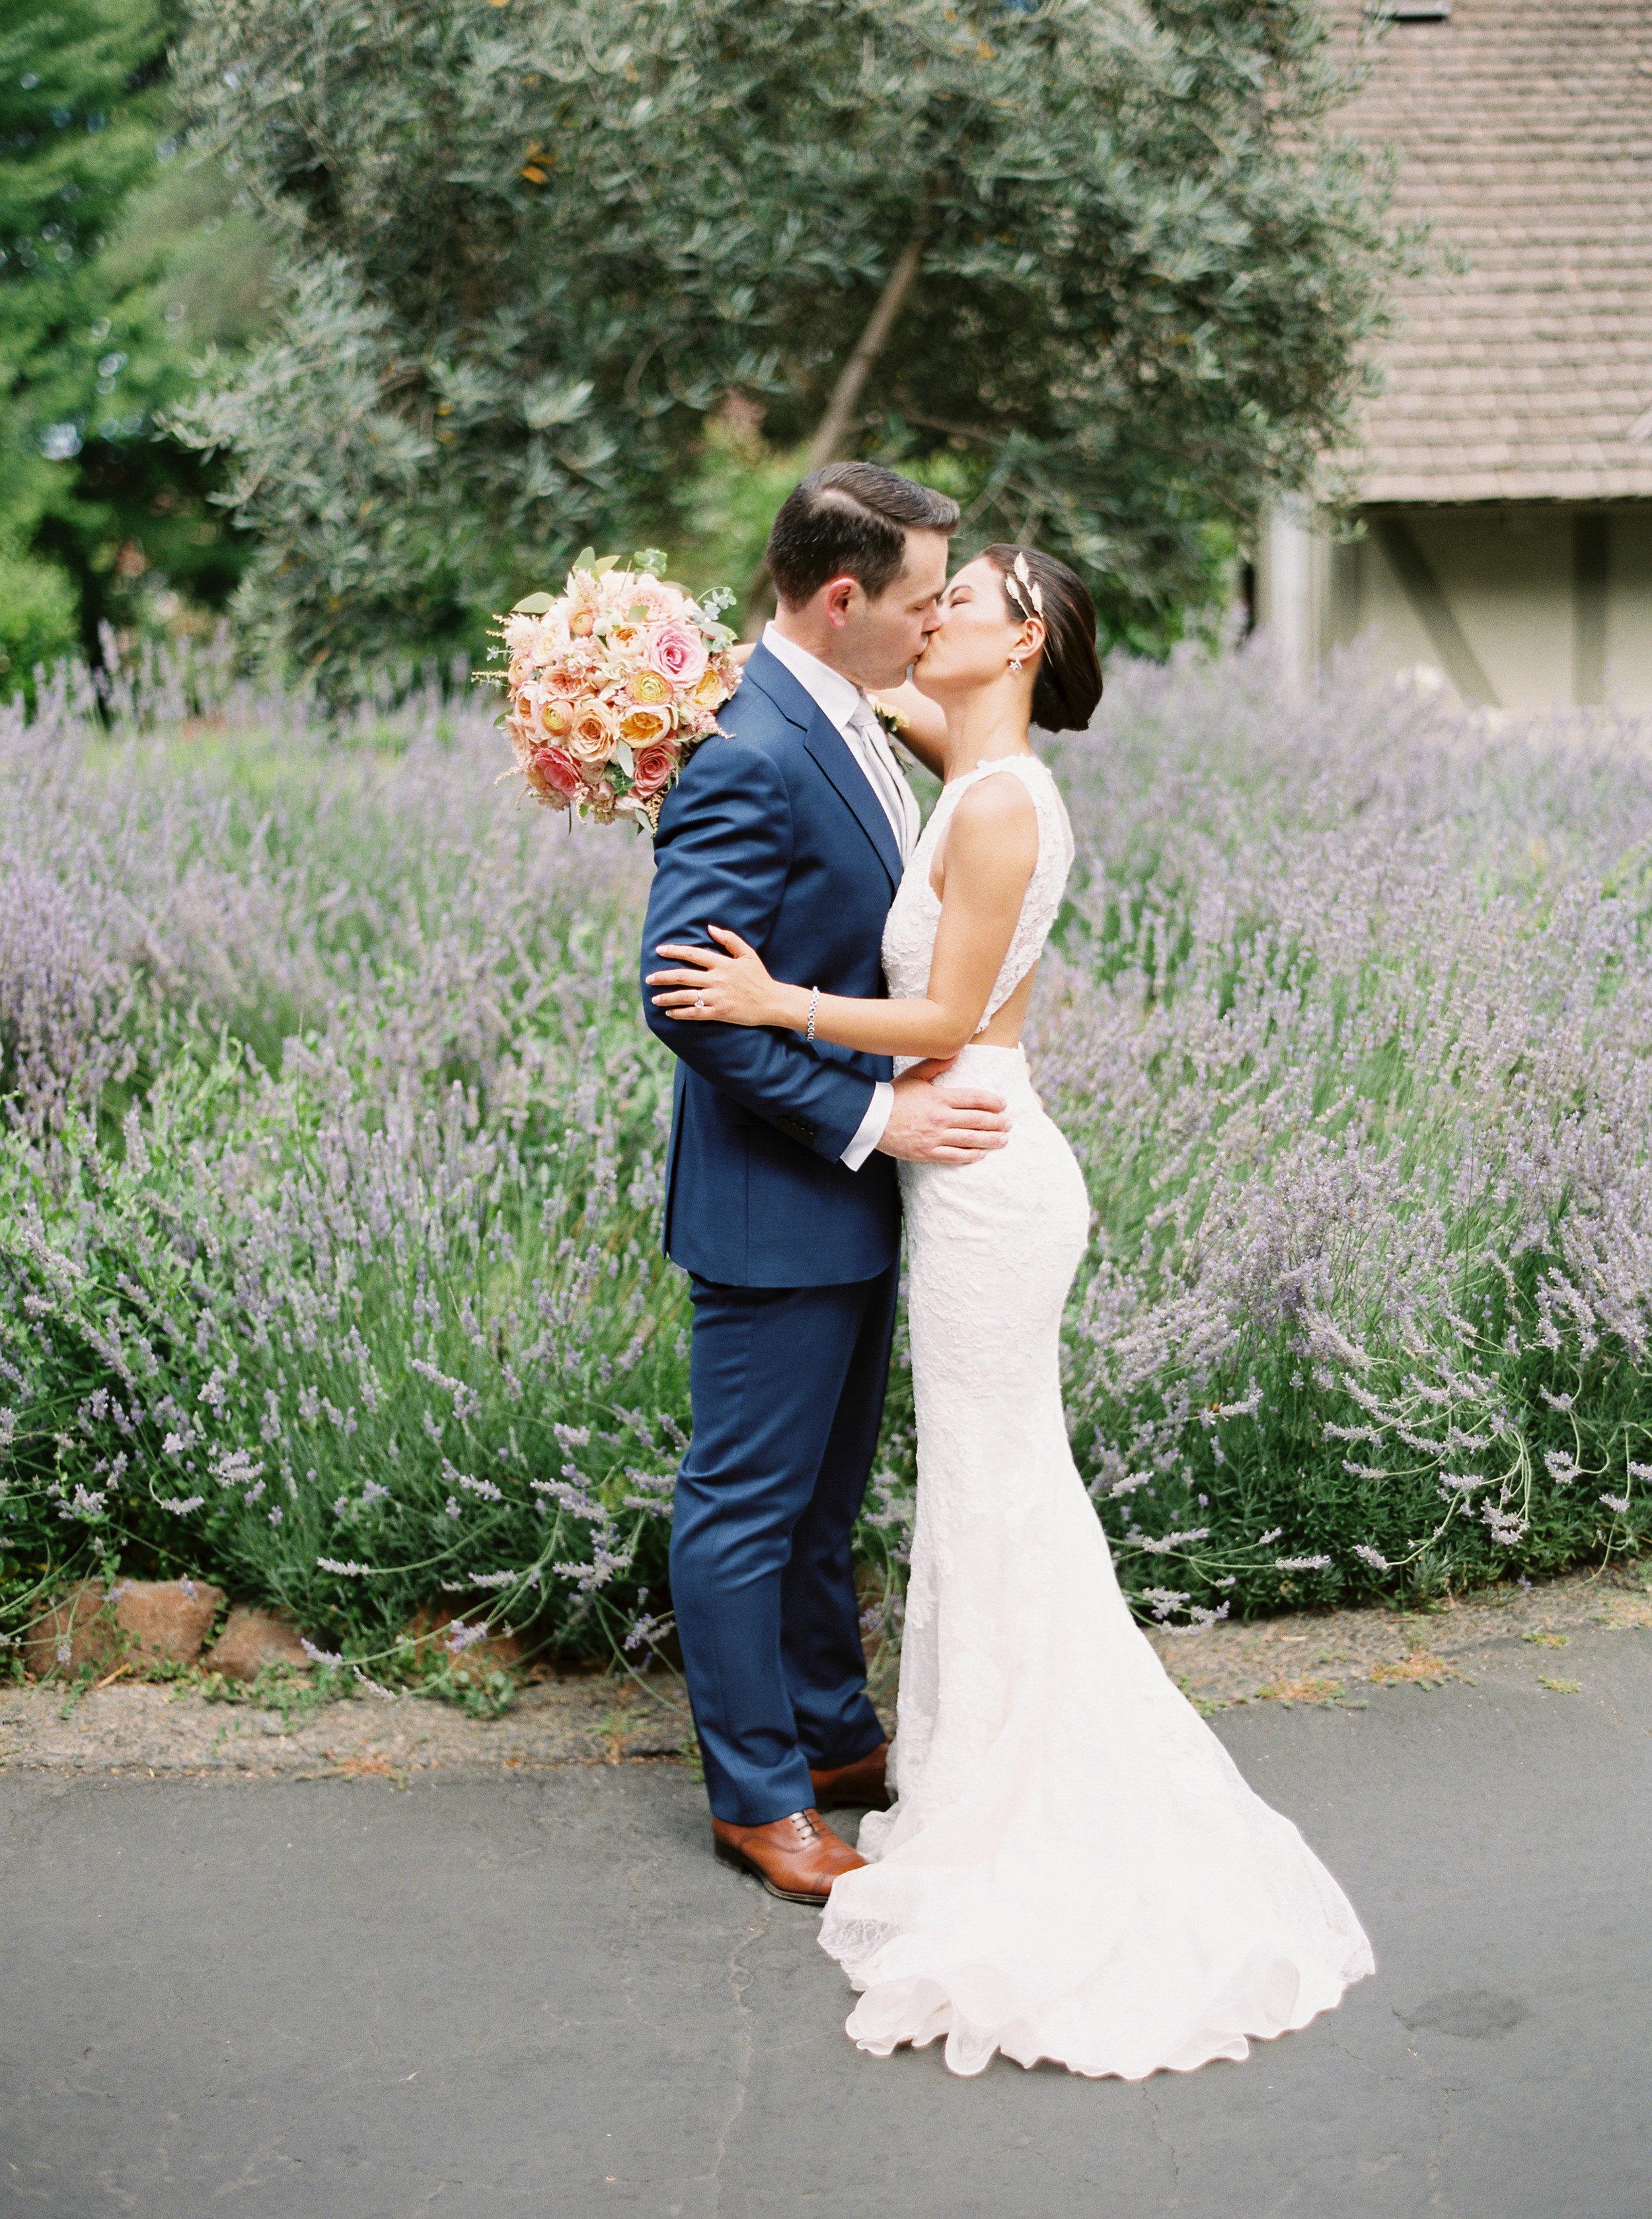 Harvest-inn-wedding-in-napa-california-179.jpg